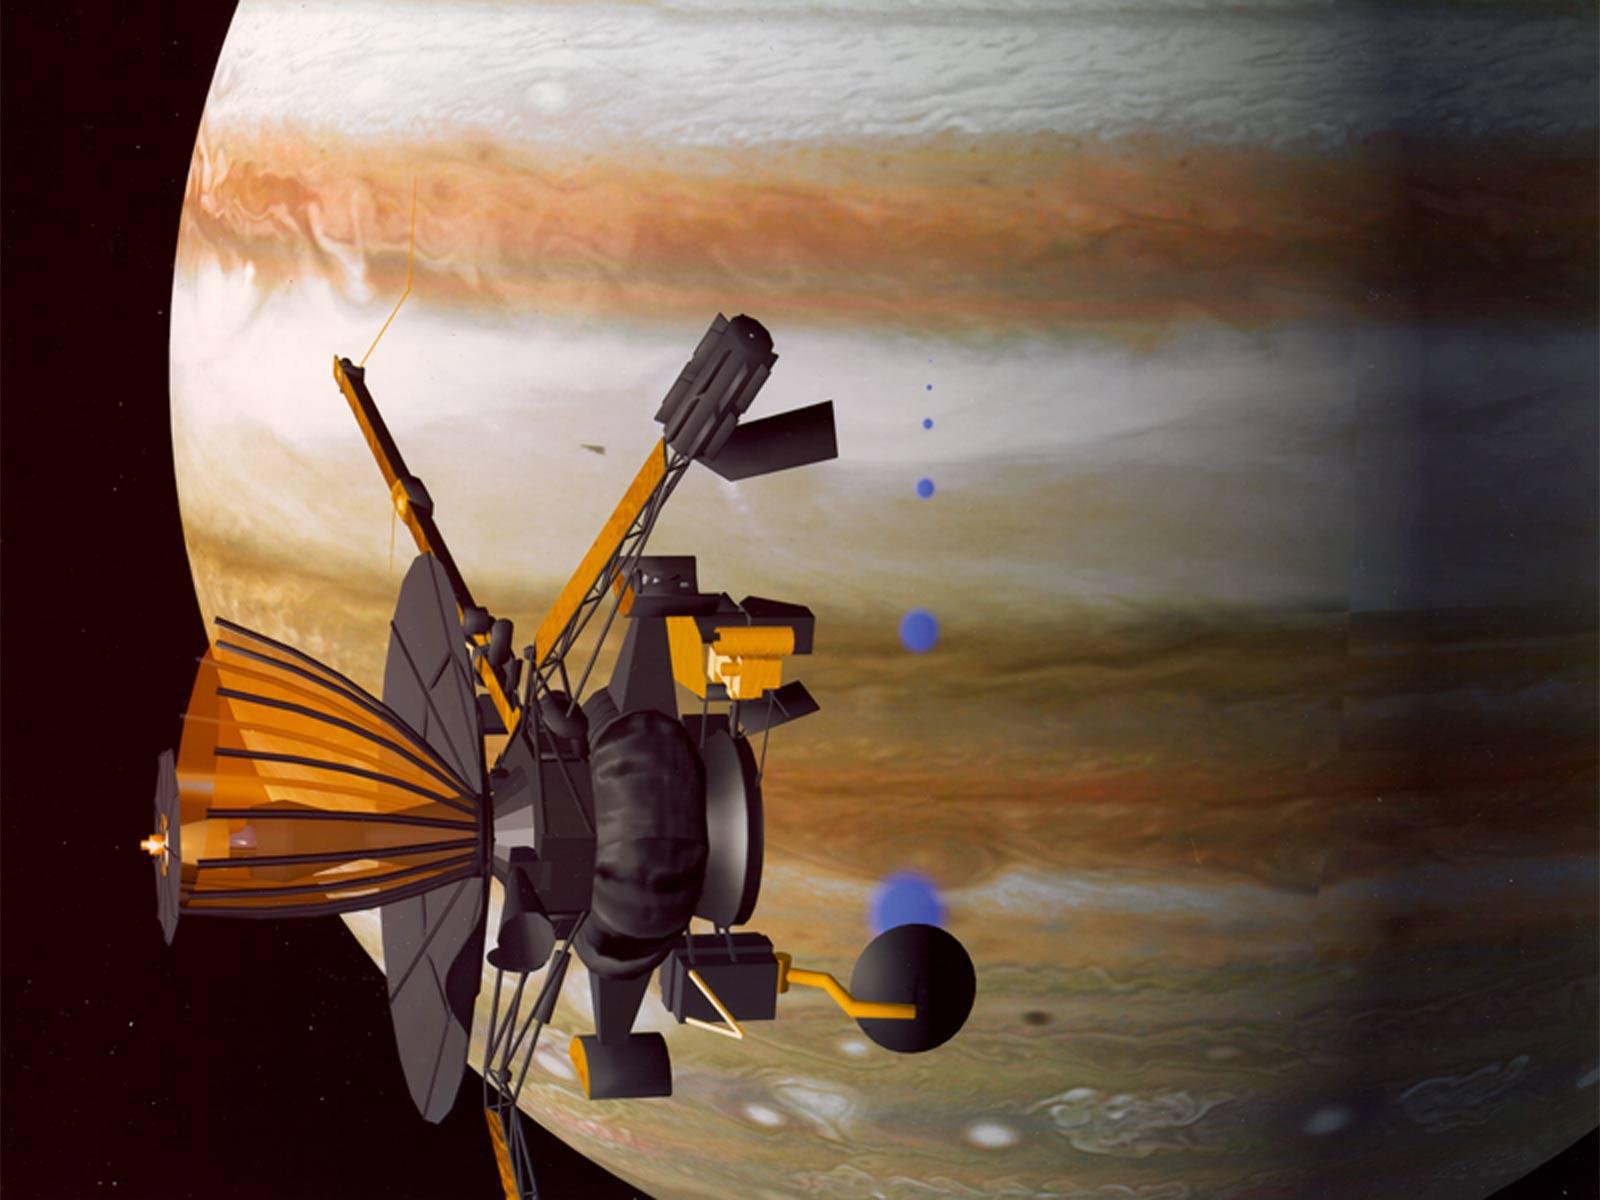 Galileo Mission - Artist's Concept | NASA